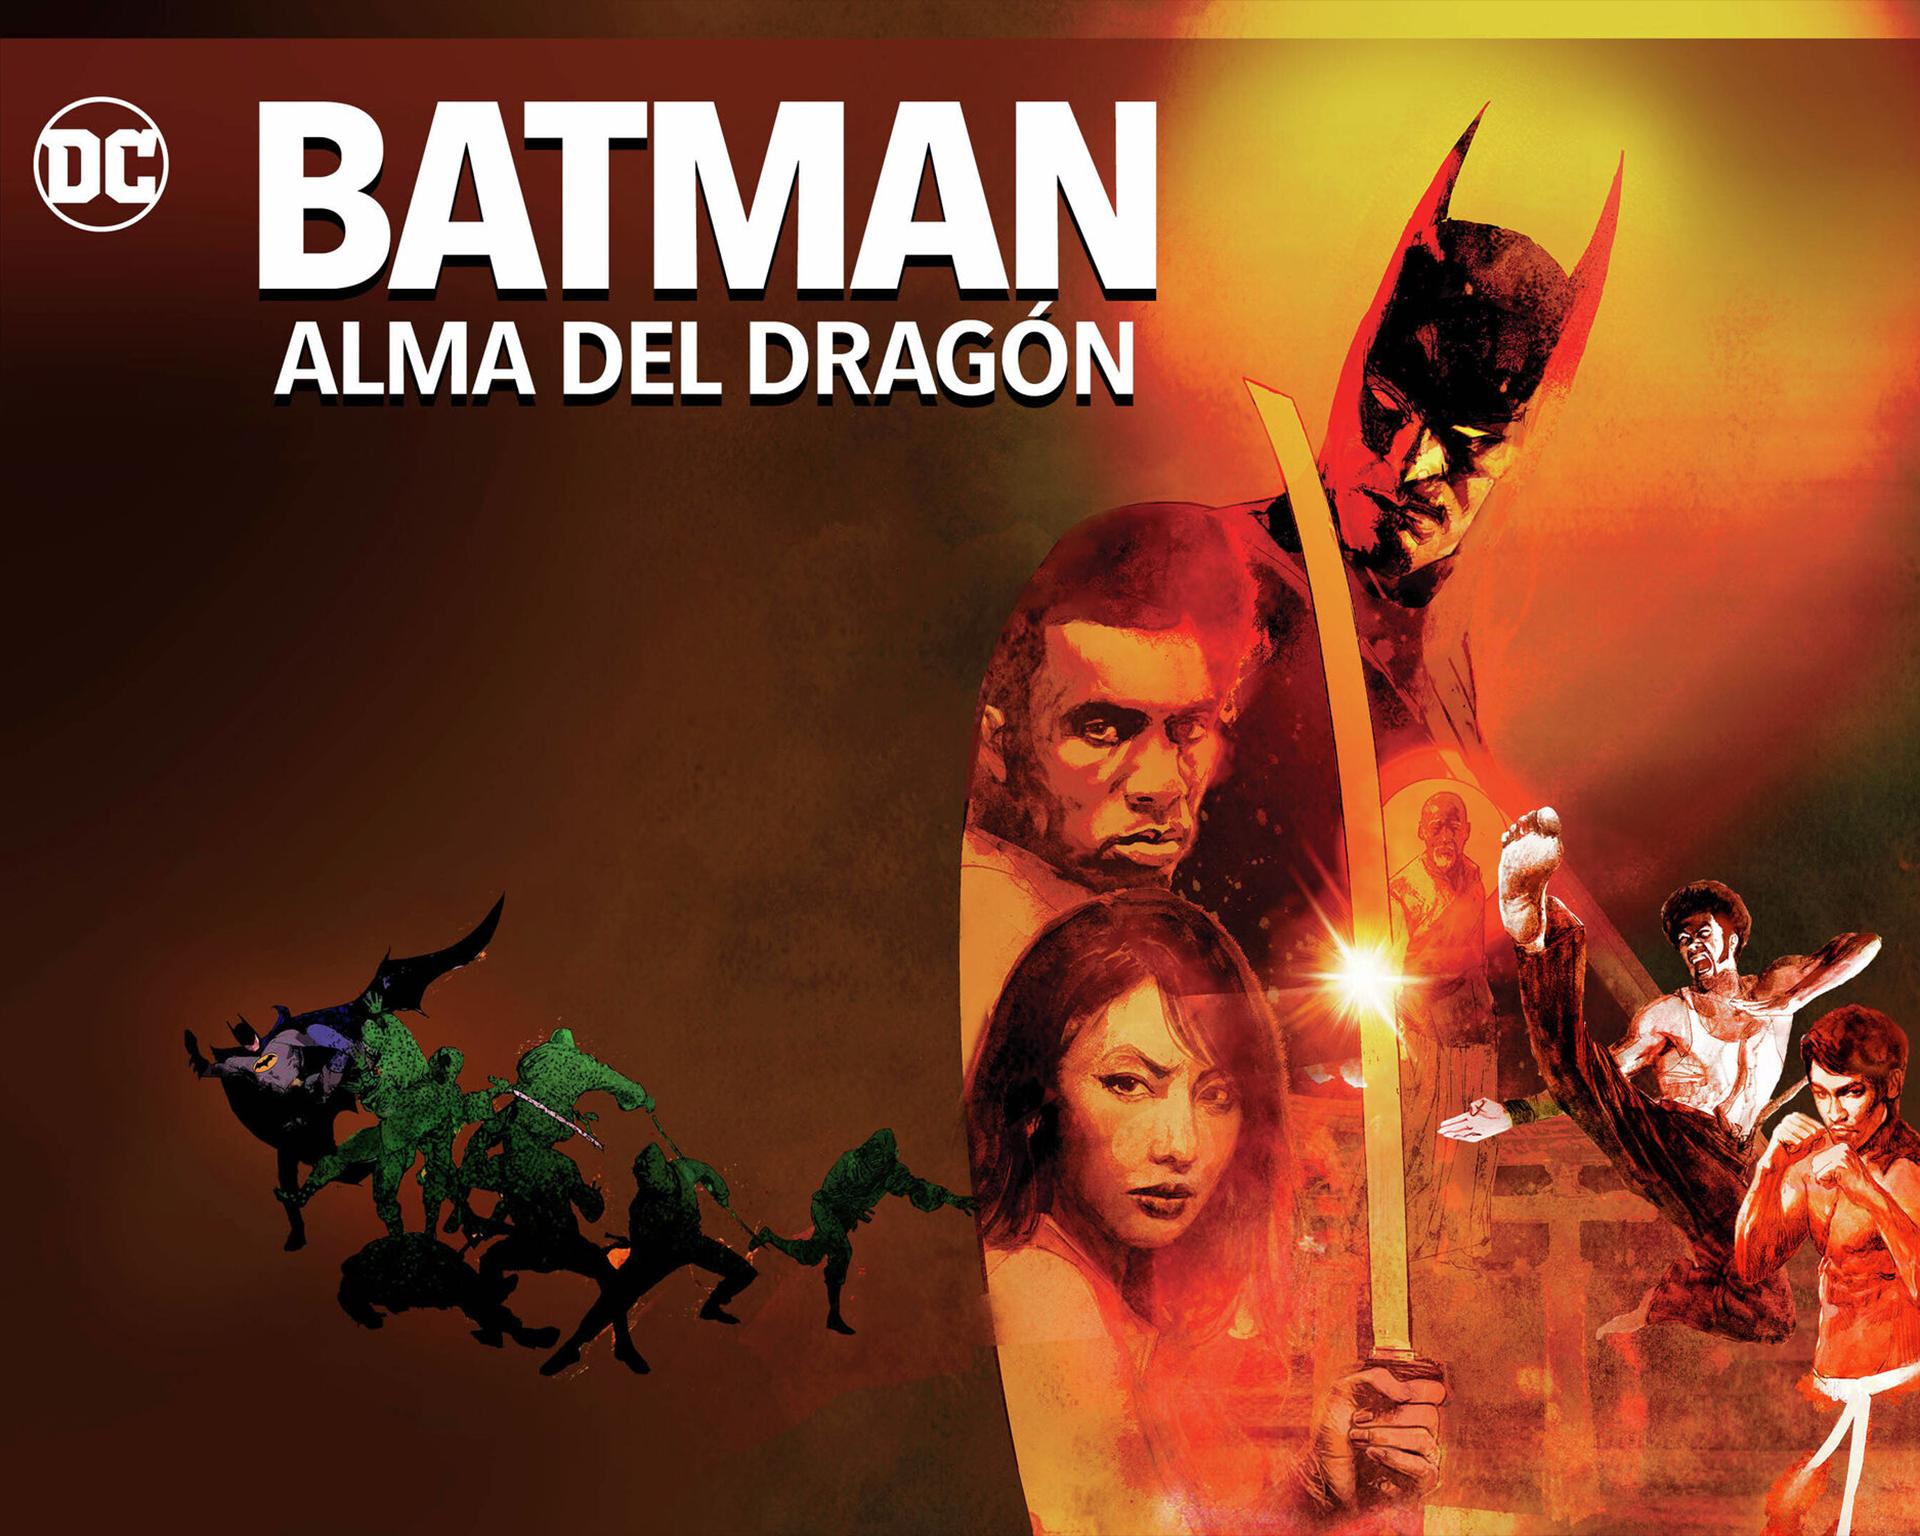 Batman, caballero de la noche, 70s, alma de dragon, WB, DC